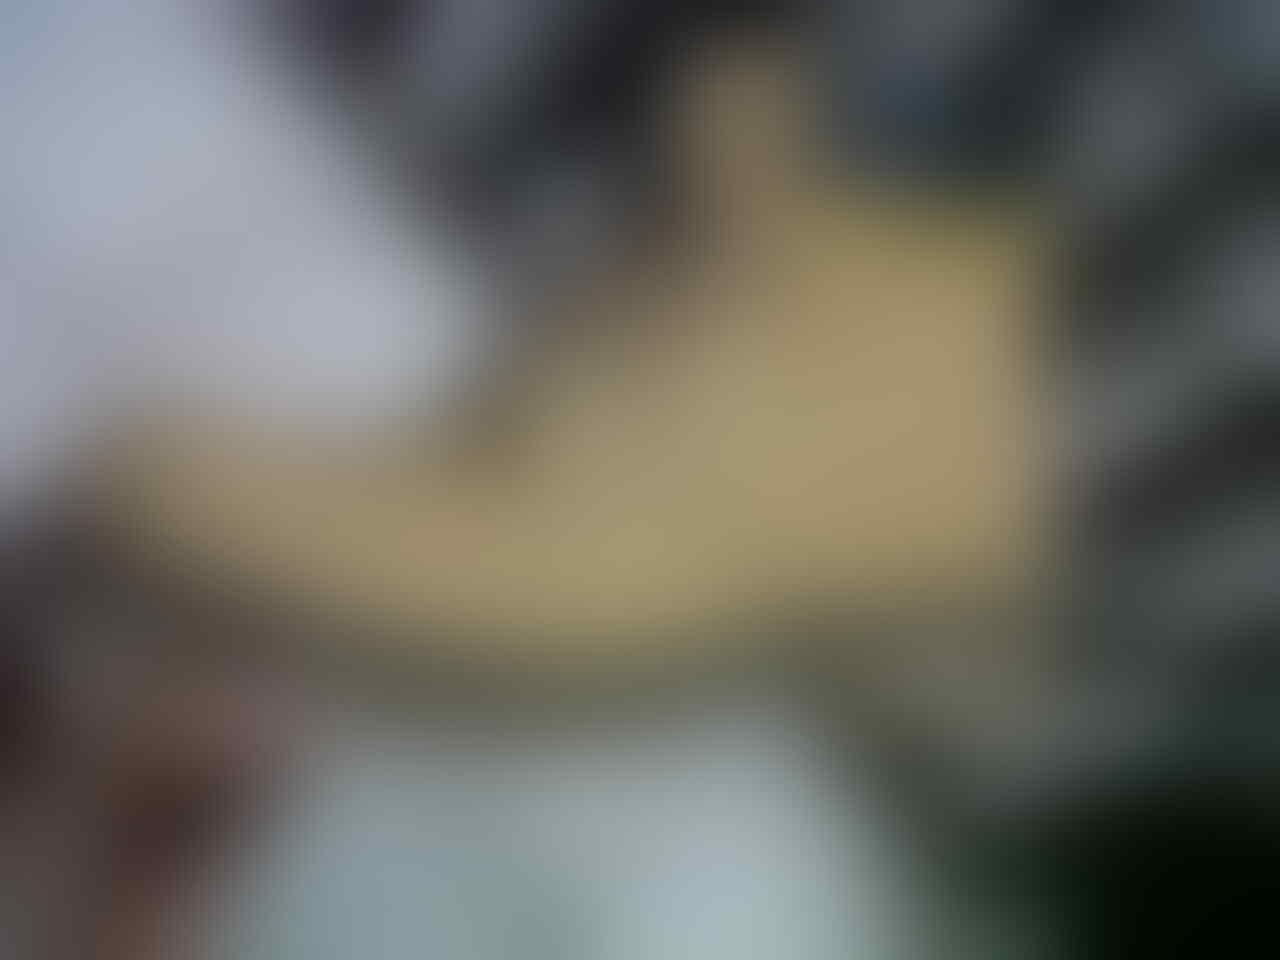 Sepatu Caterpillar/Caterboot muraahhhh